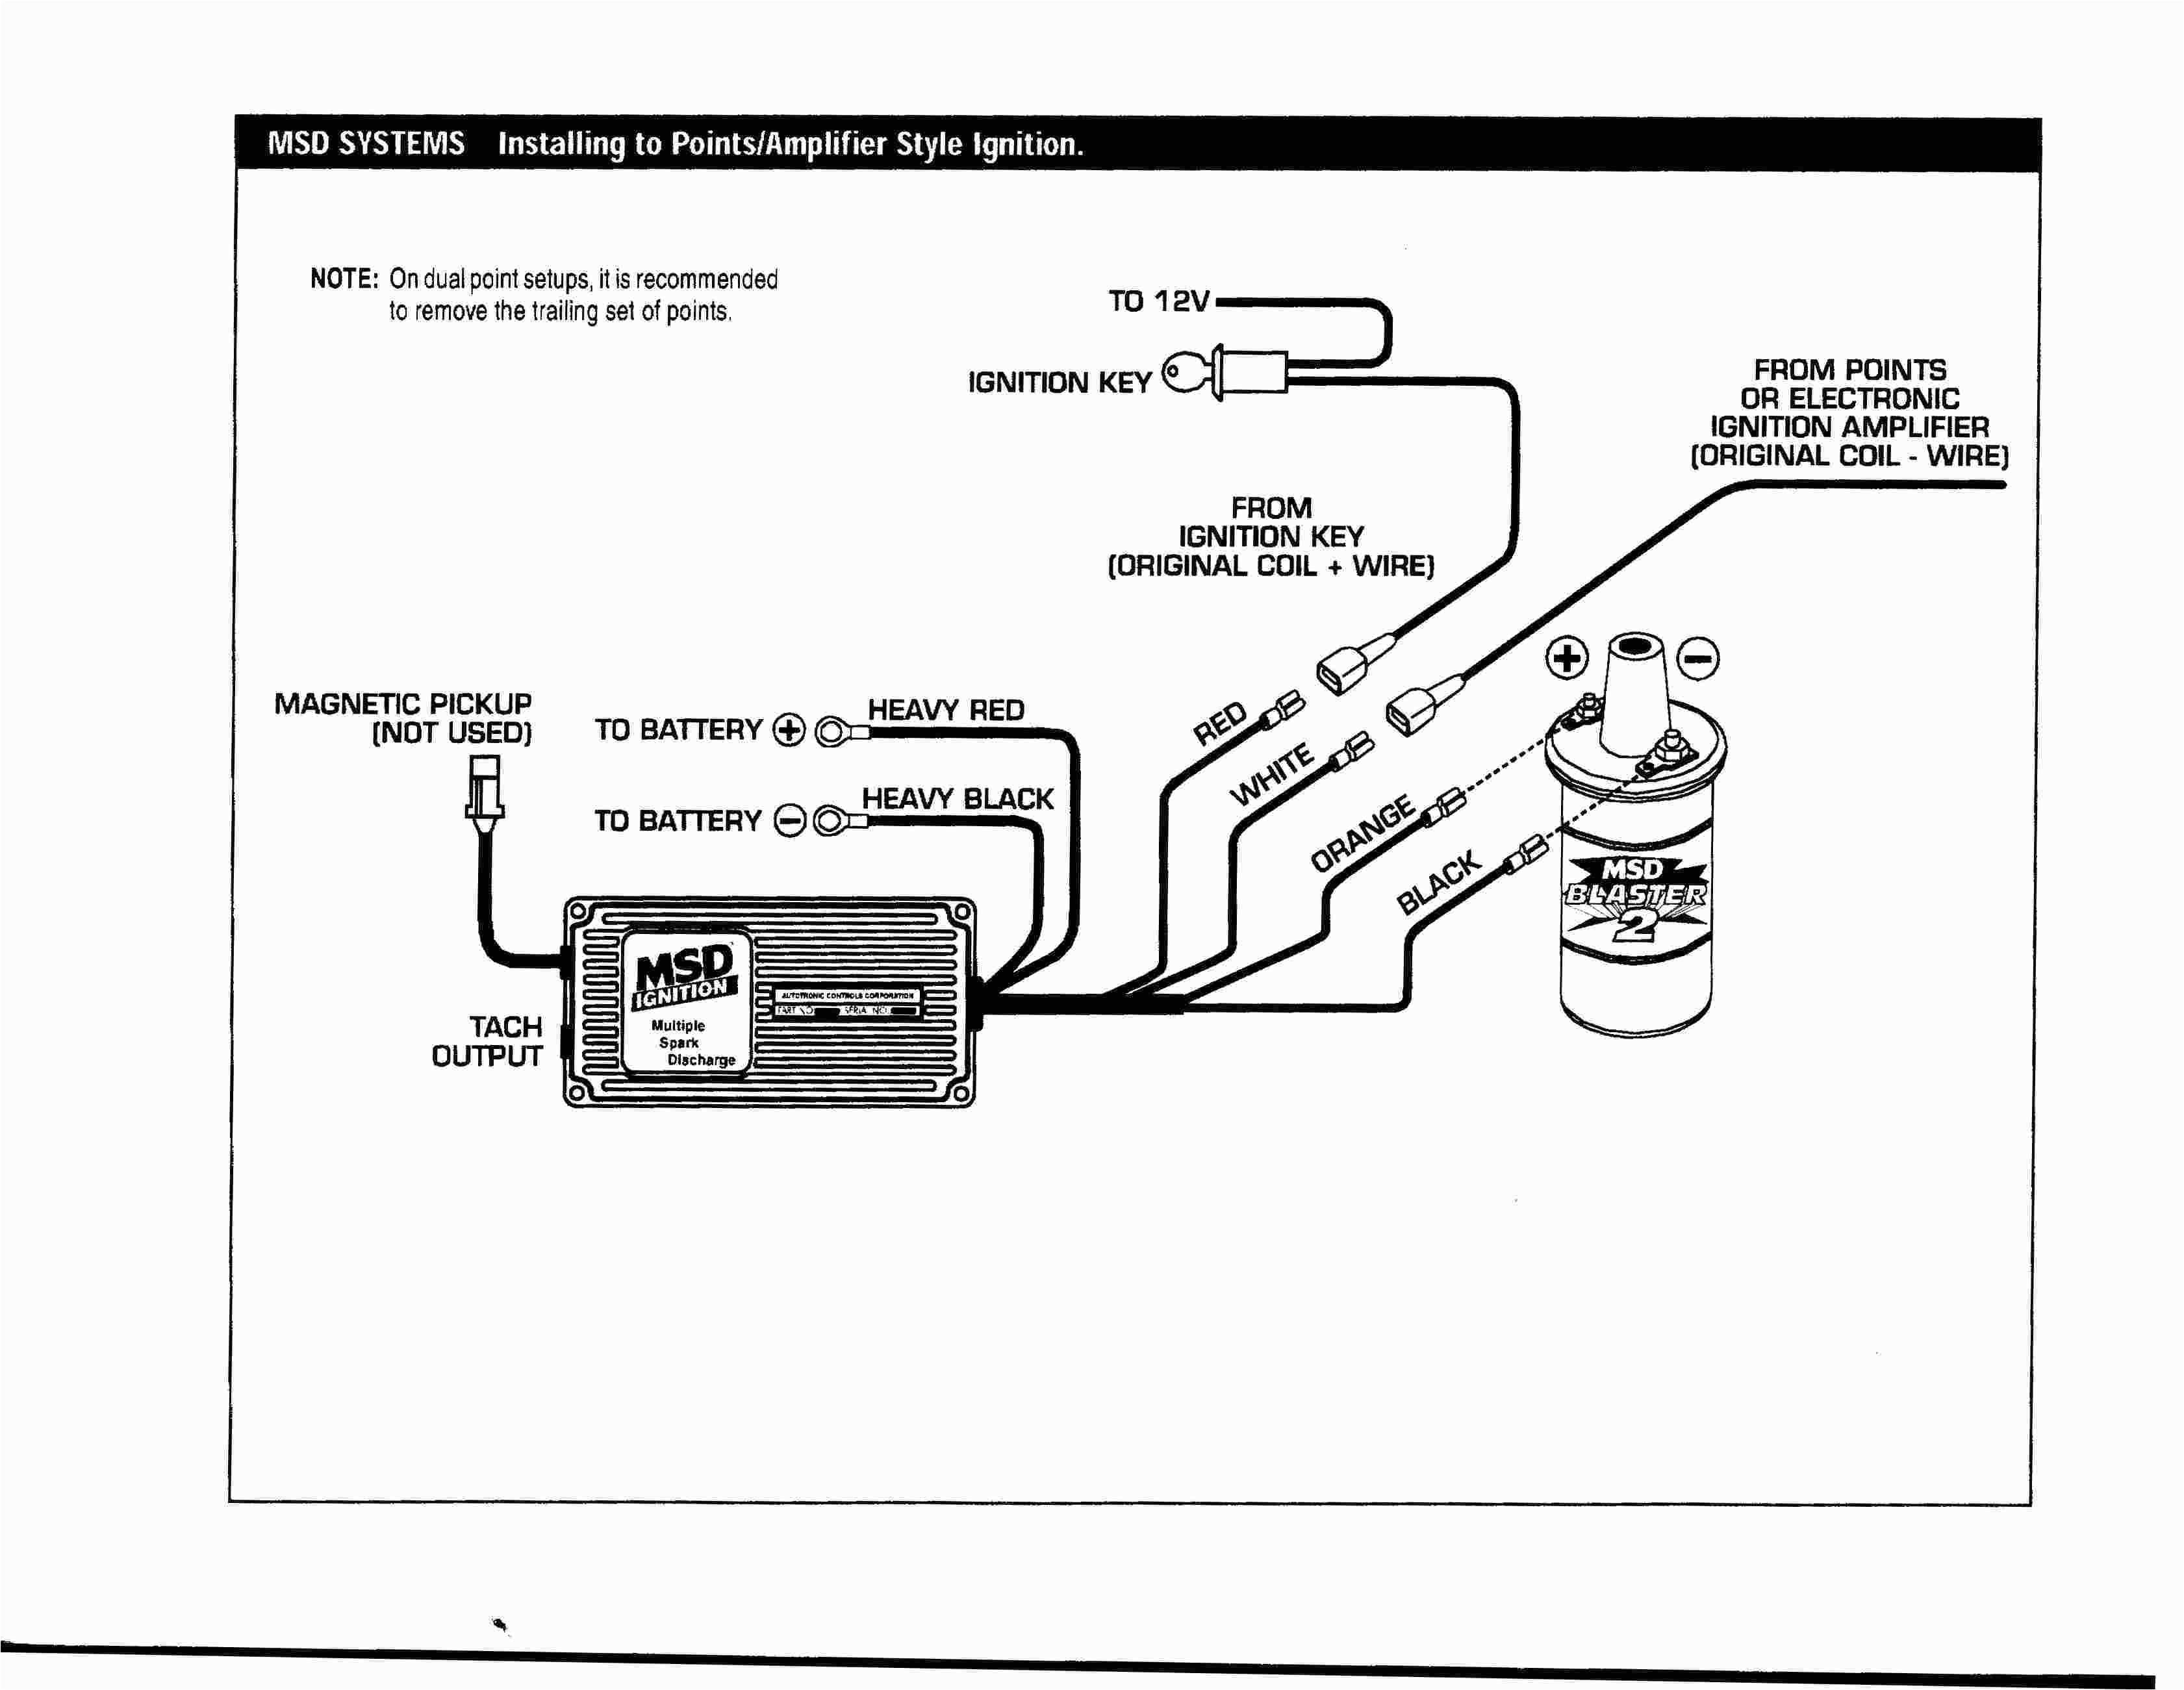 msd ignition 6al 6420 wiring diagram msd 6420 wiring diagram with ignition 6al 4j jpg